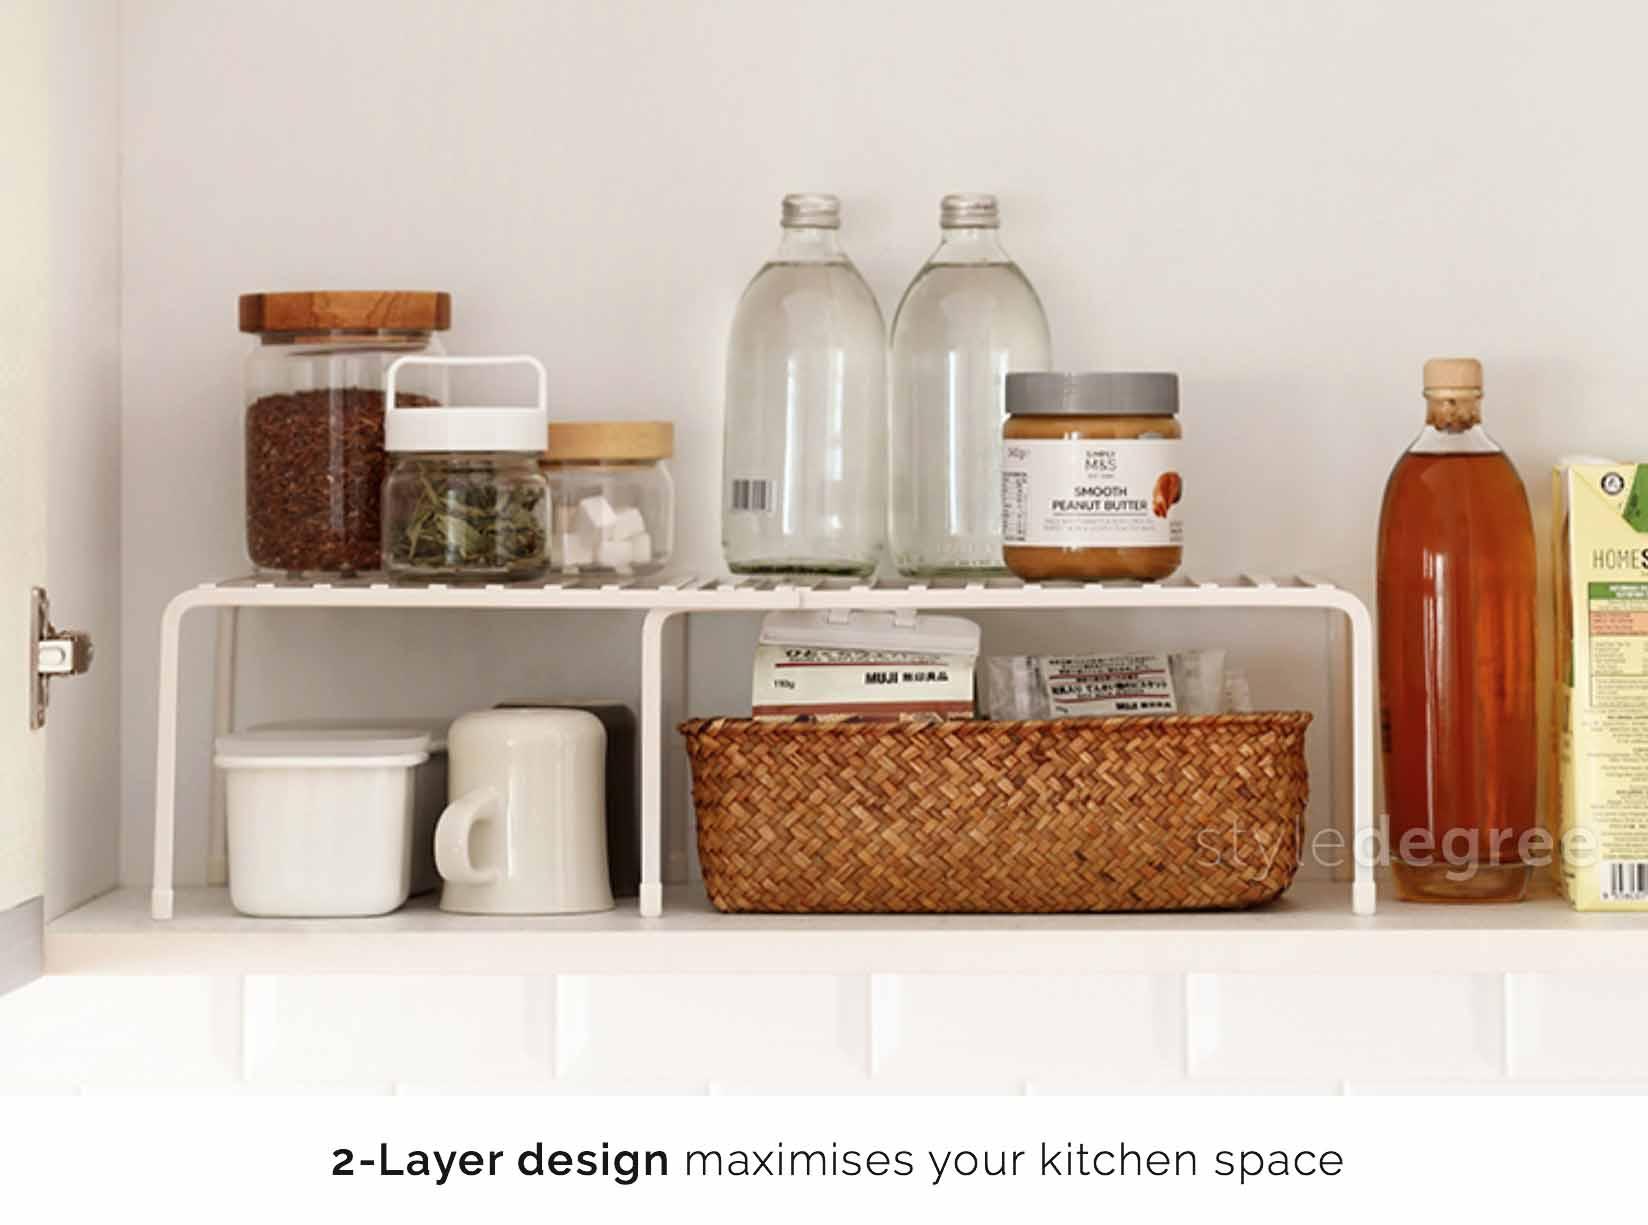 kitchen organizer corner nook extendable rack style degree cabinet tabletop organiser pot pans utensils holder sg singapore